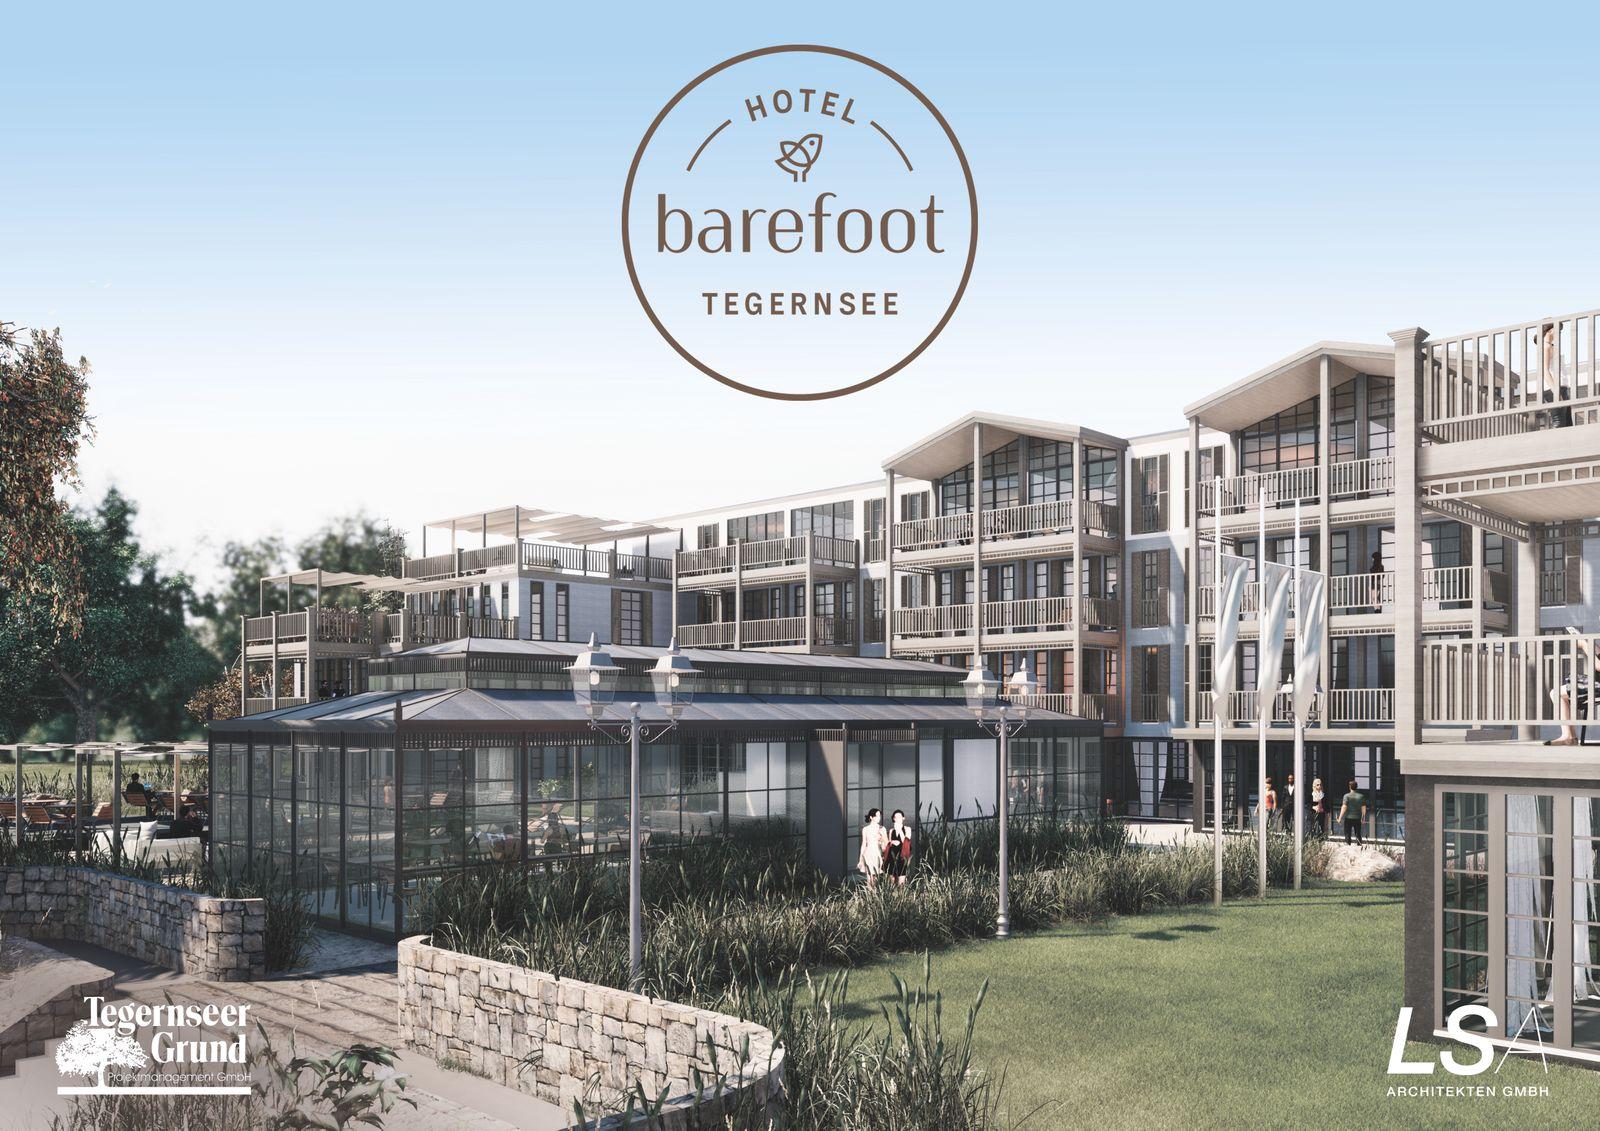 barefoot HOTEL Tegernsee_Rendering LSA Architekten (7)